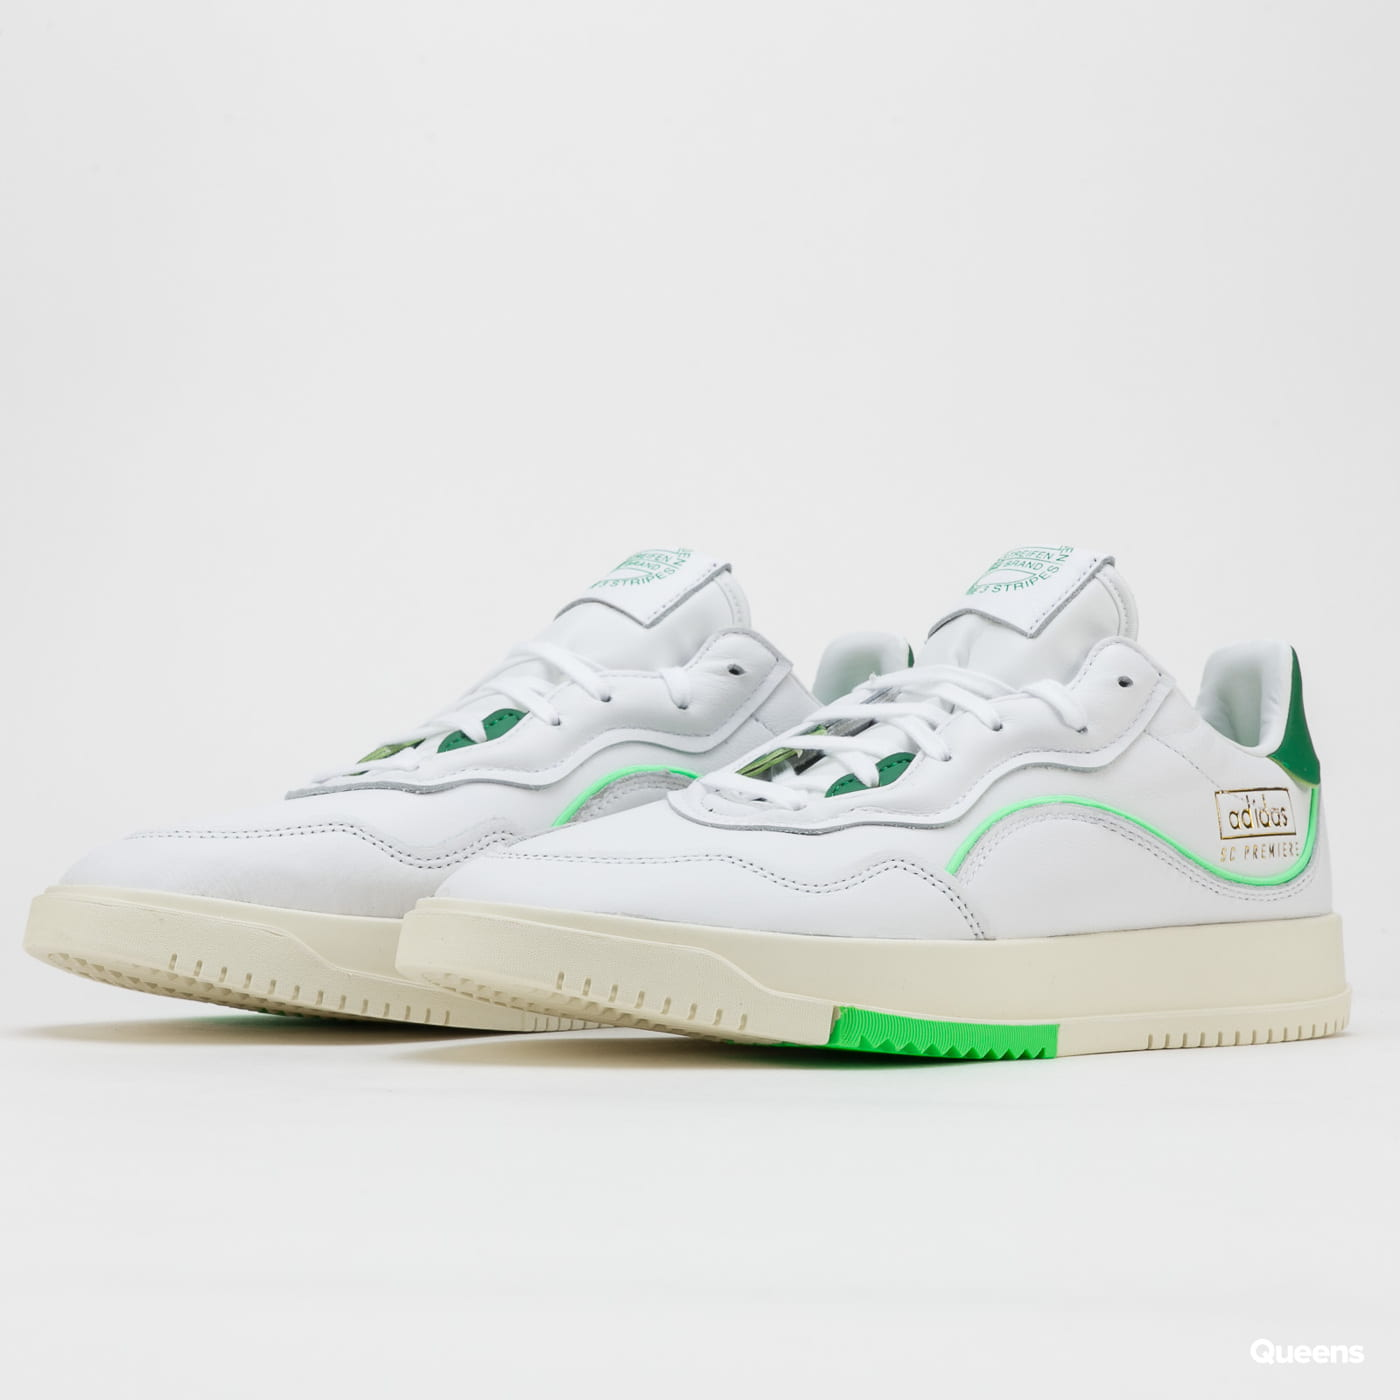 adidas Originals SC Premiere ftwwht / green / sholim